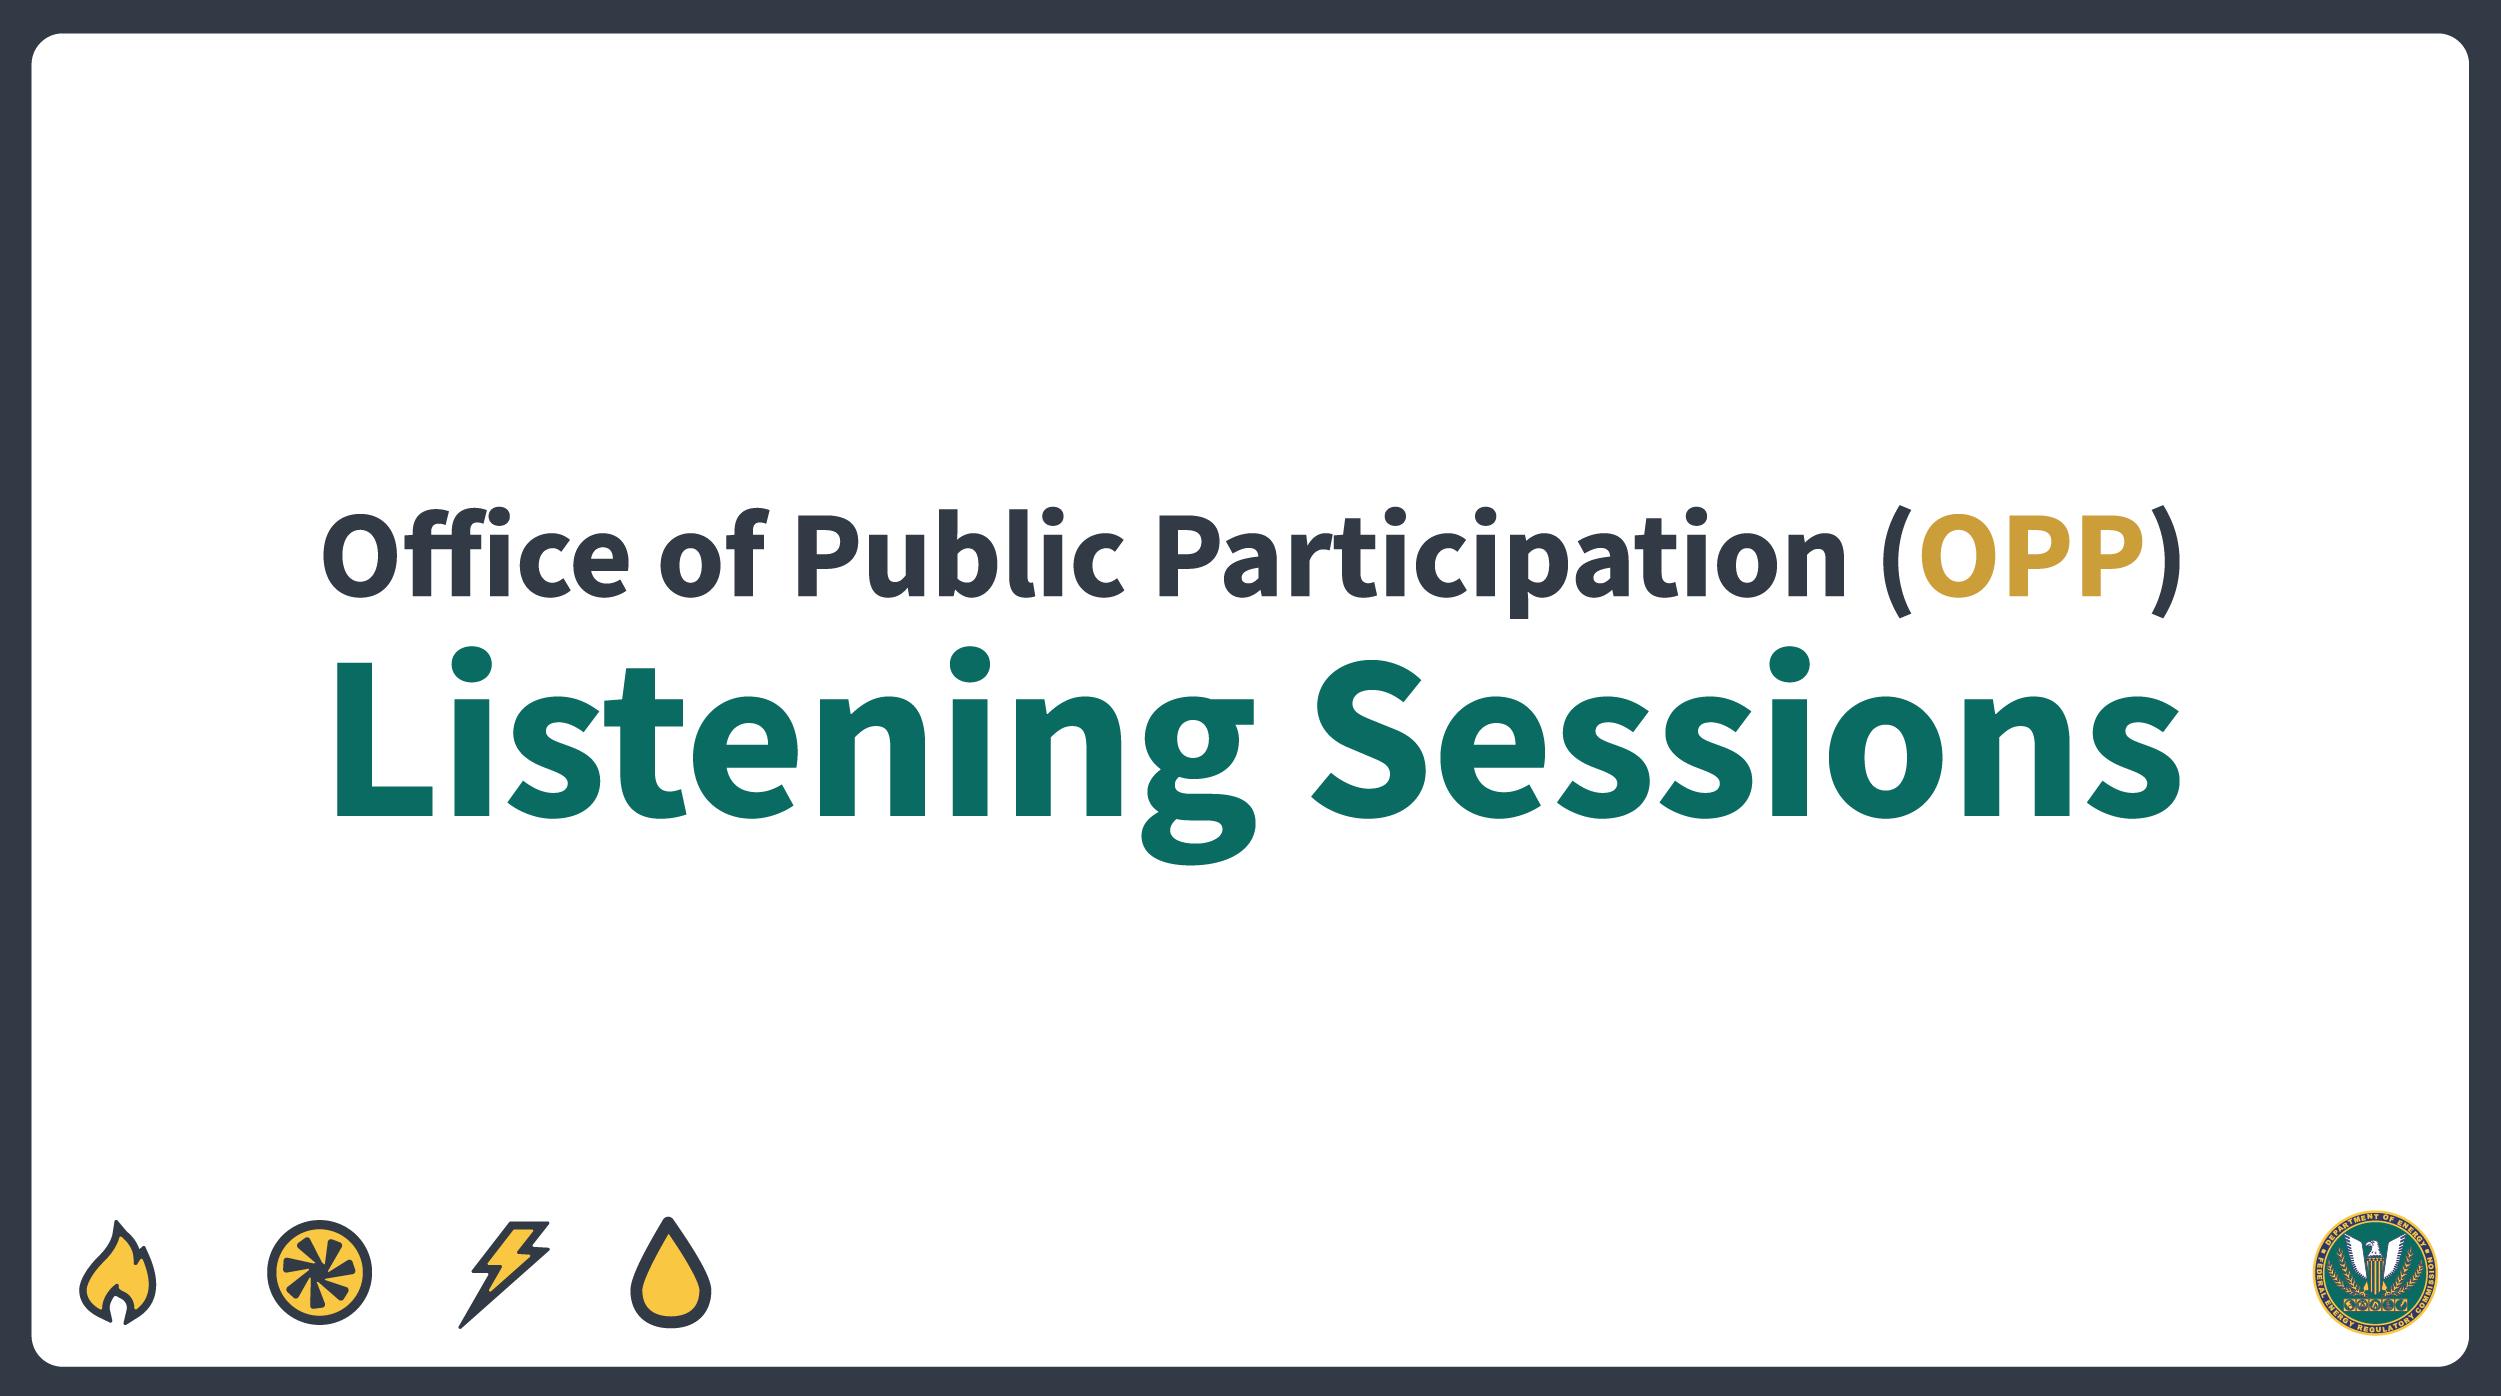 FERC Office of Public Participation listening sessions